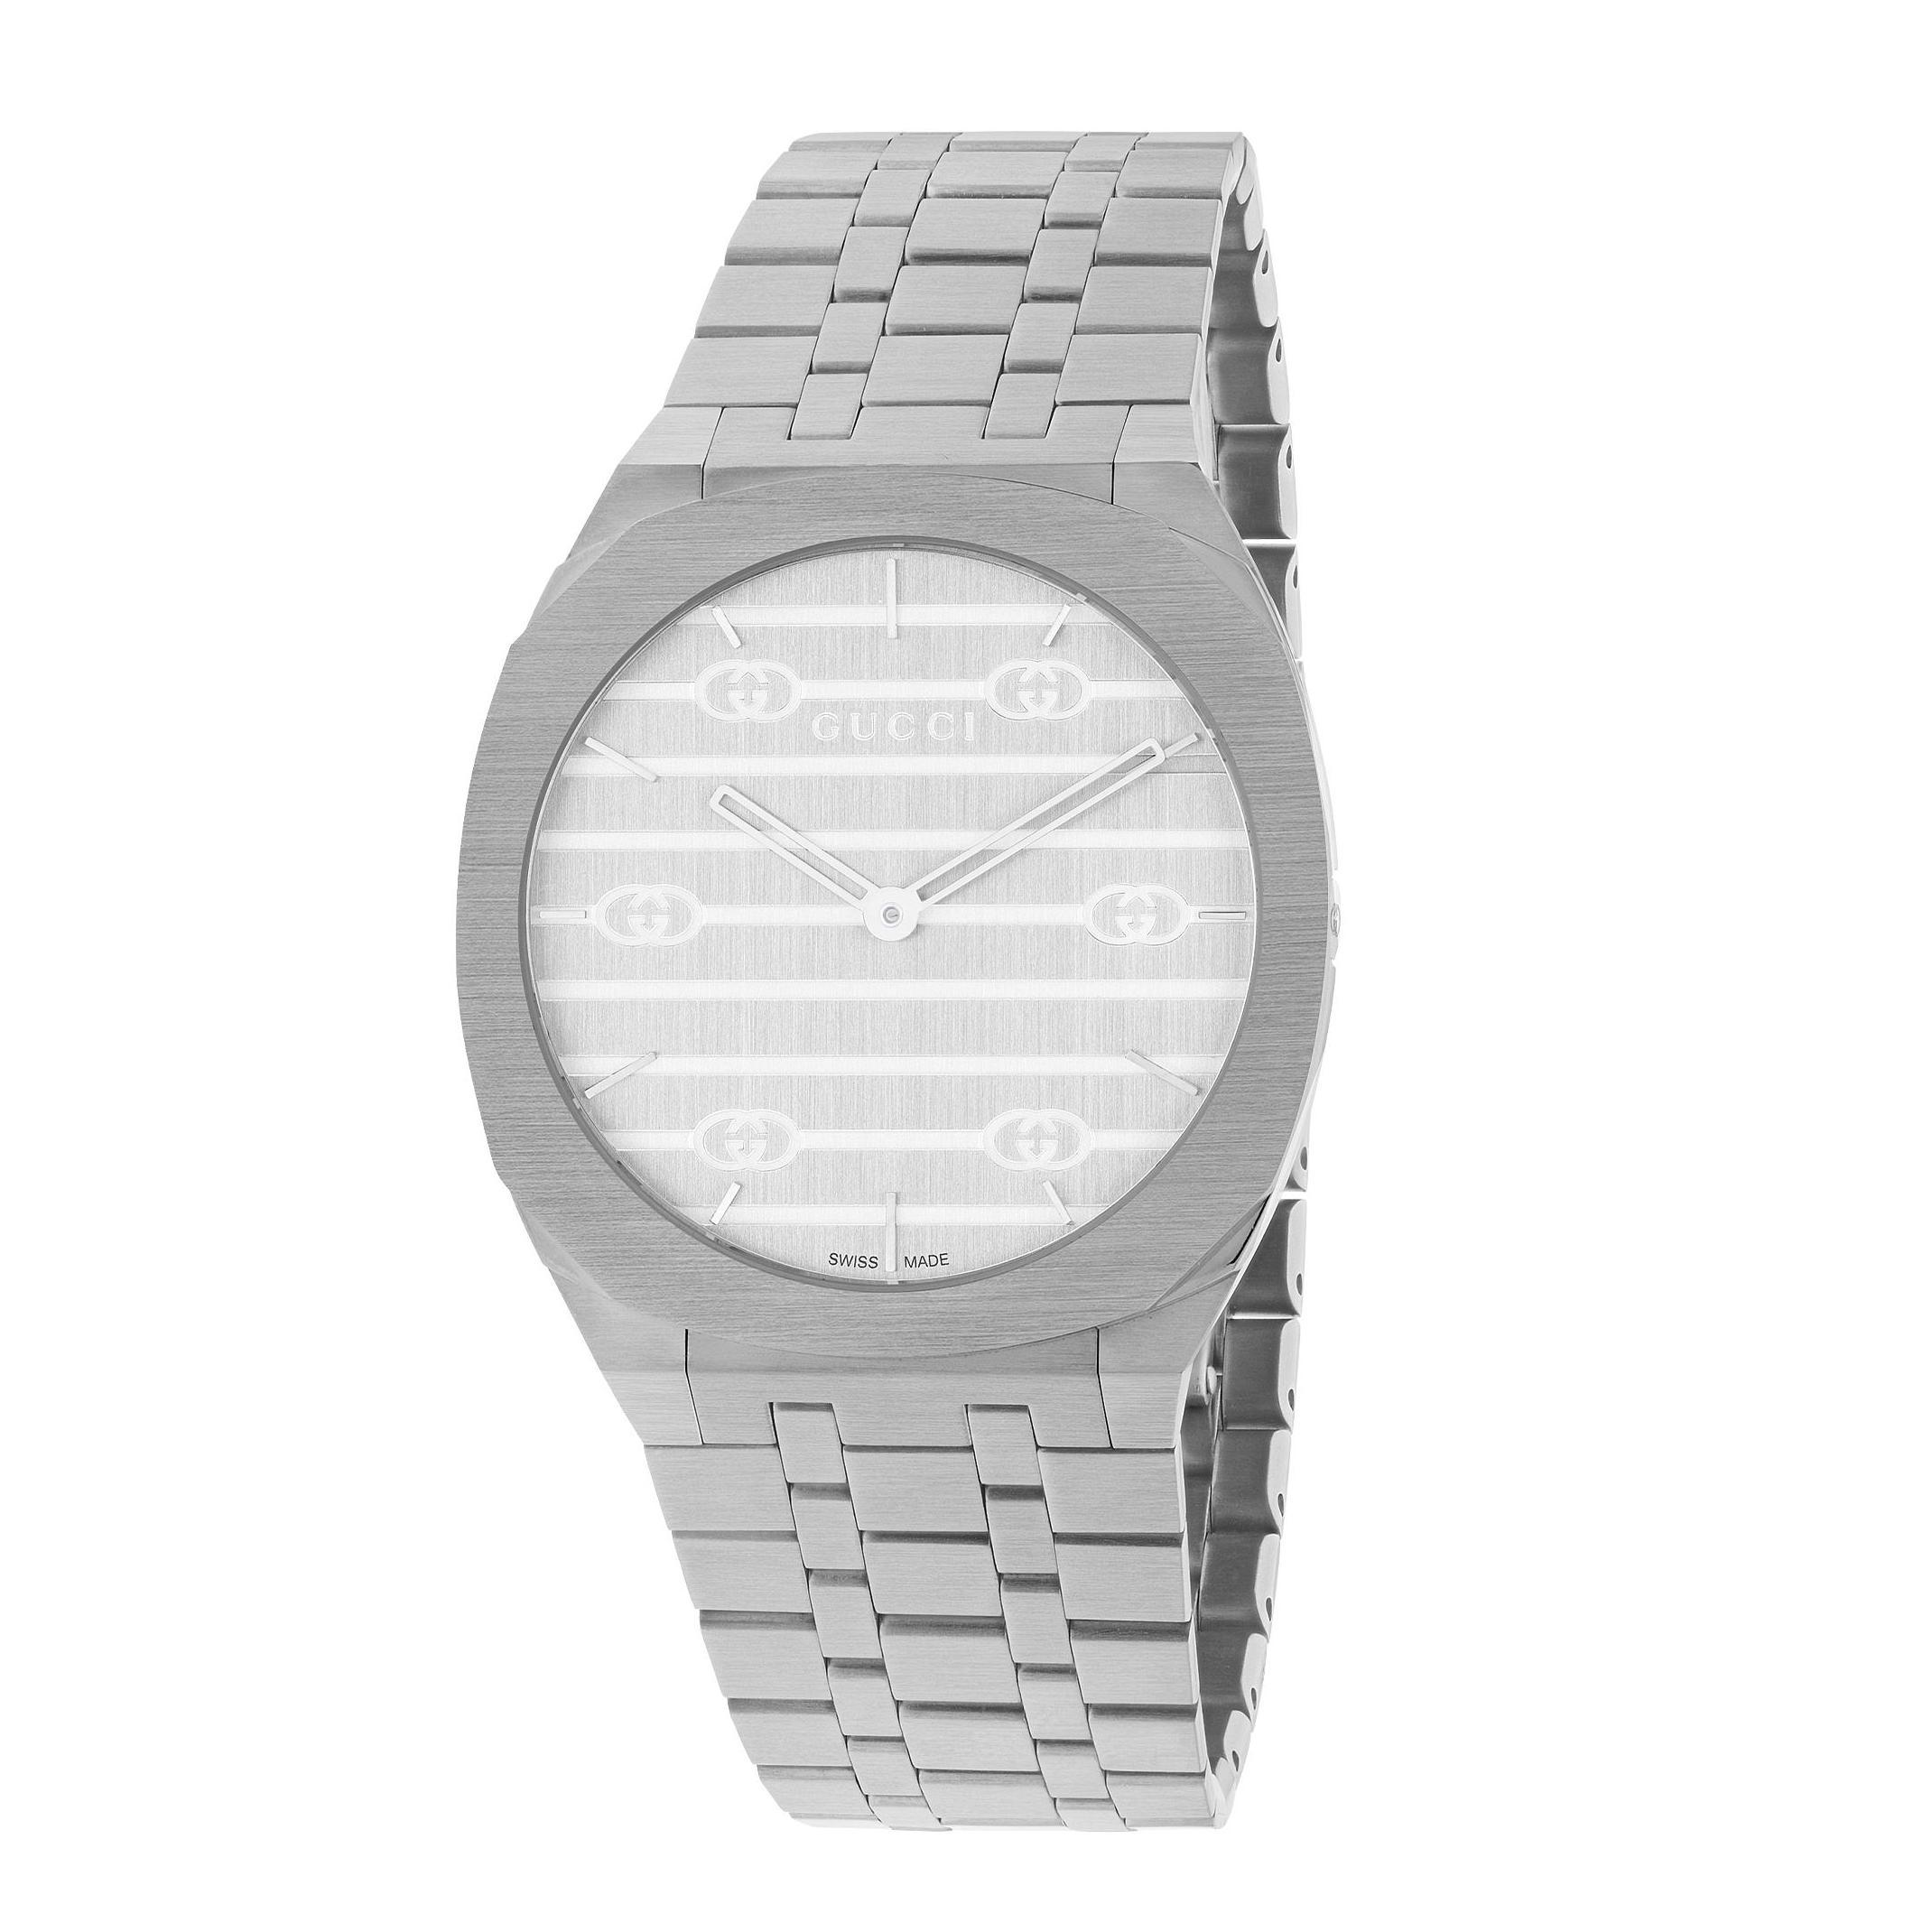 Orologio Gucci 25H 38 mm watch sconto discount